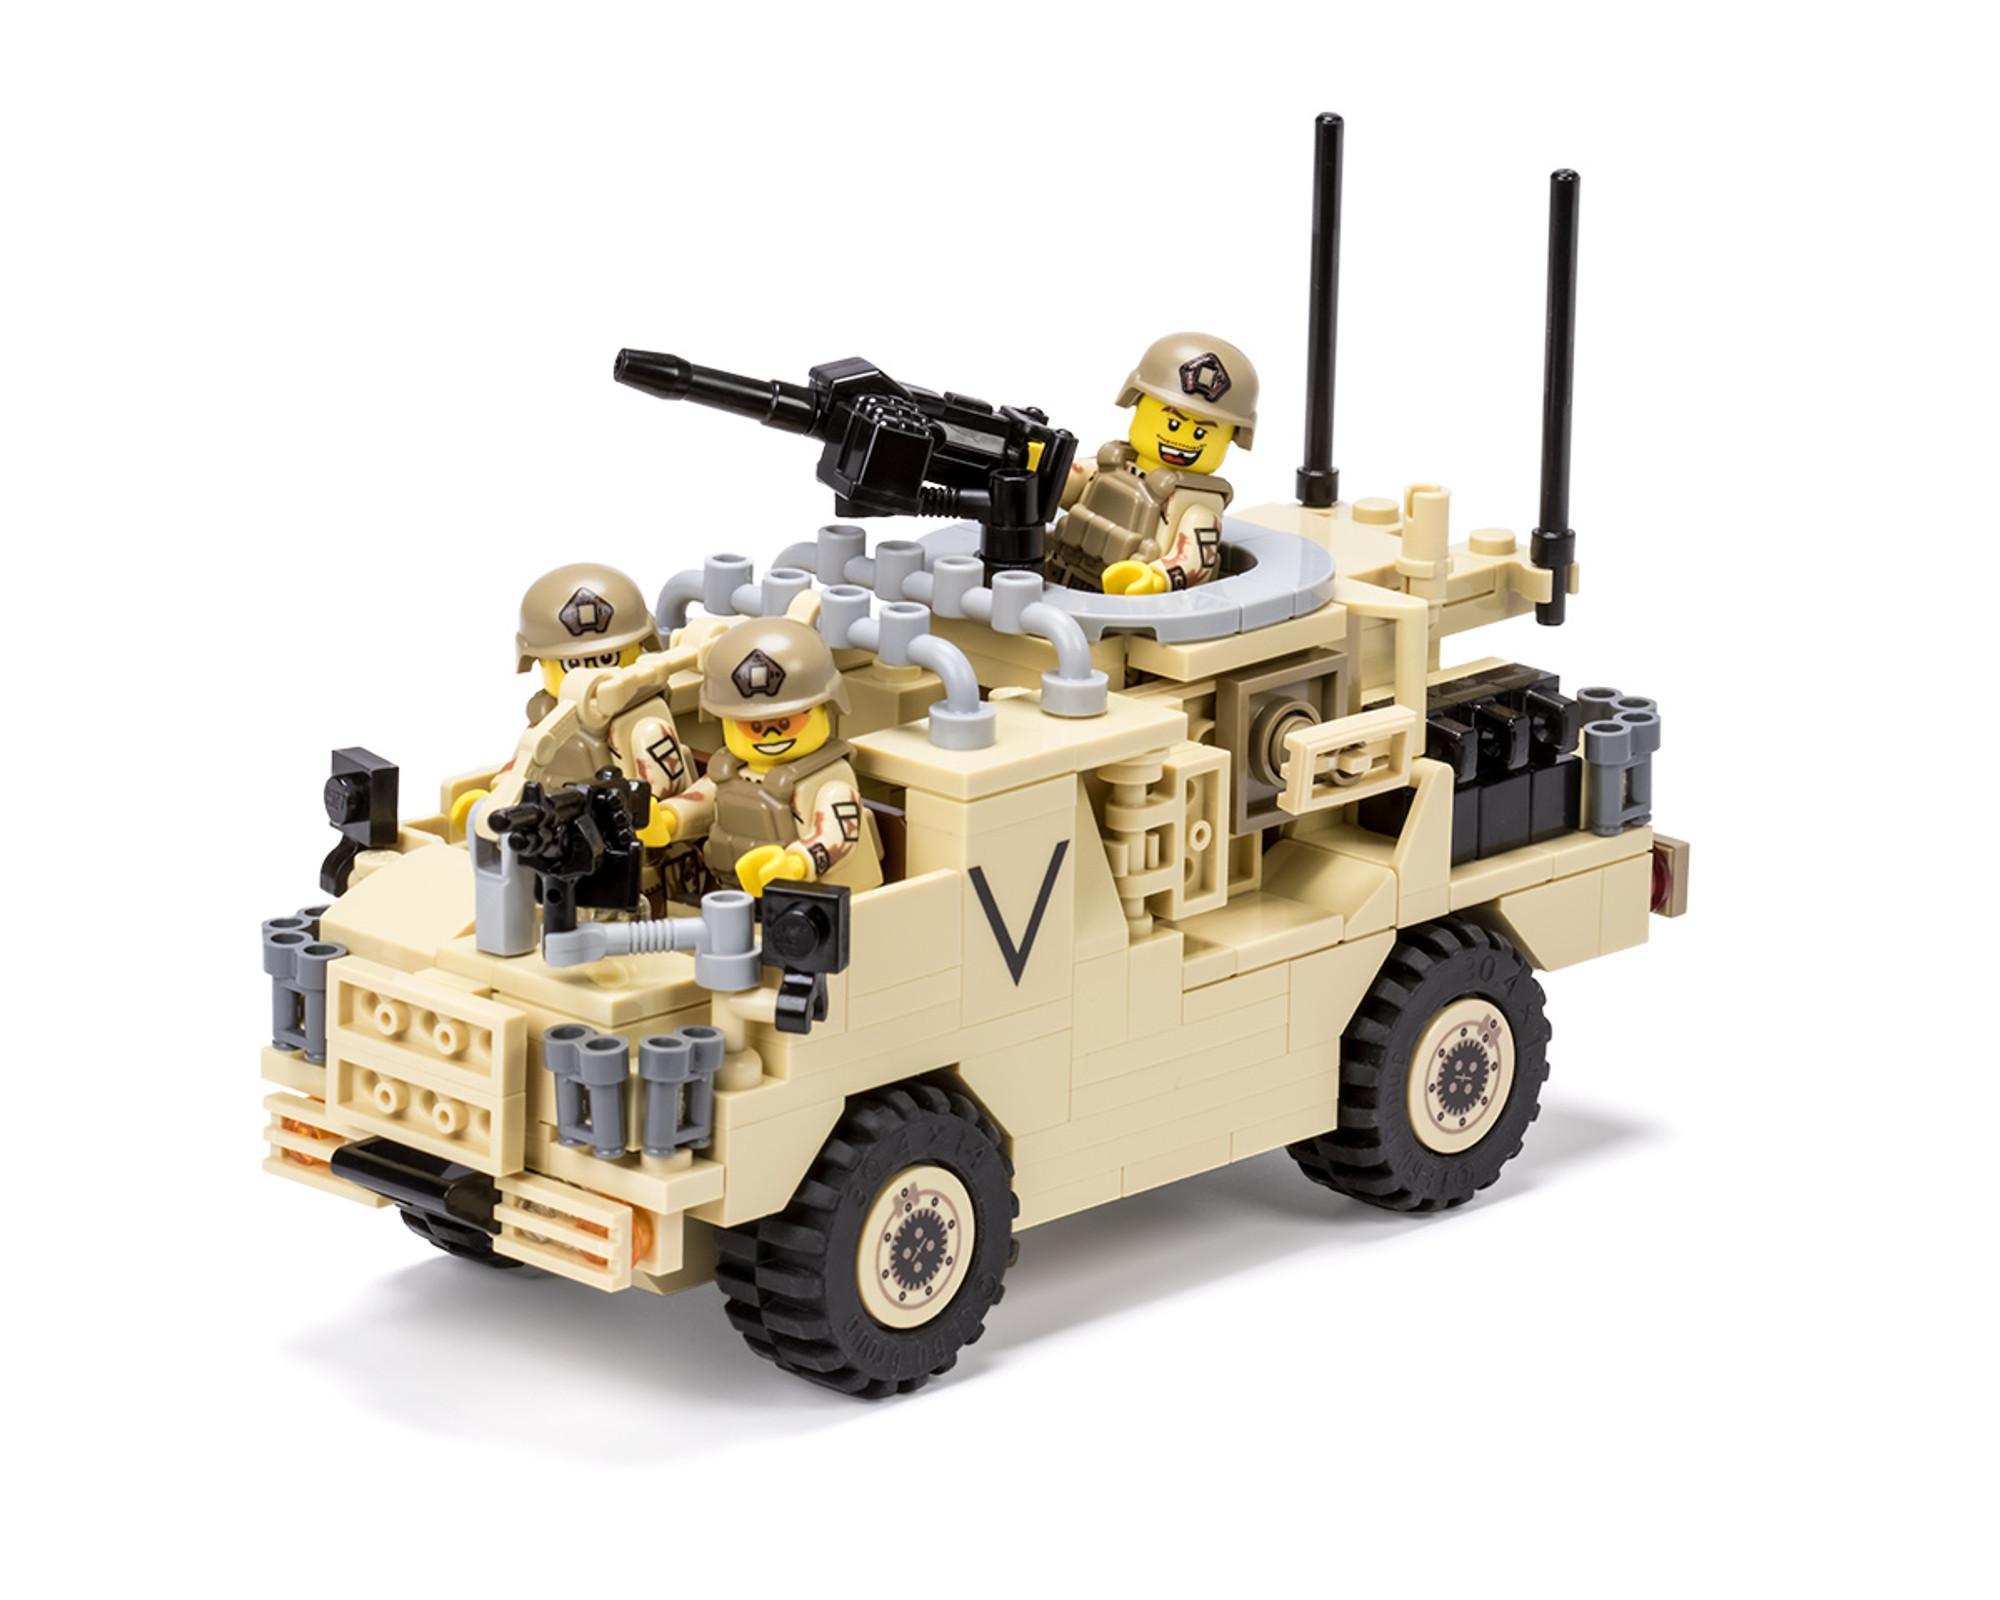 Mwmik Jackal Rapid Assault Vehicle Brickmania Toys